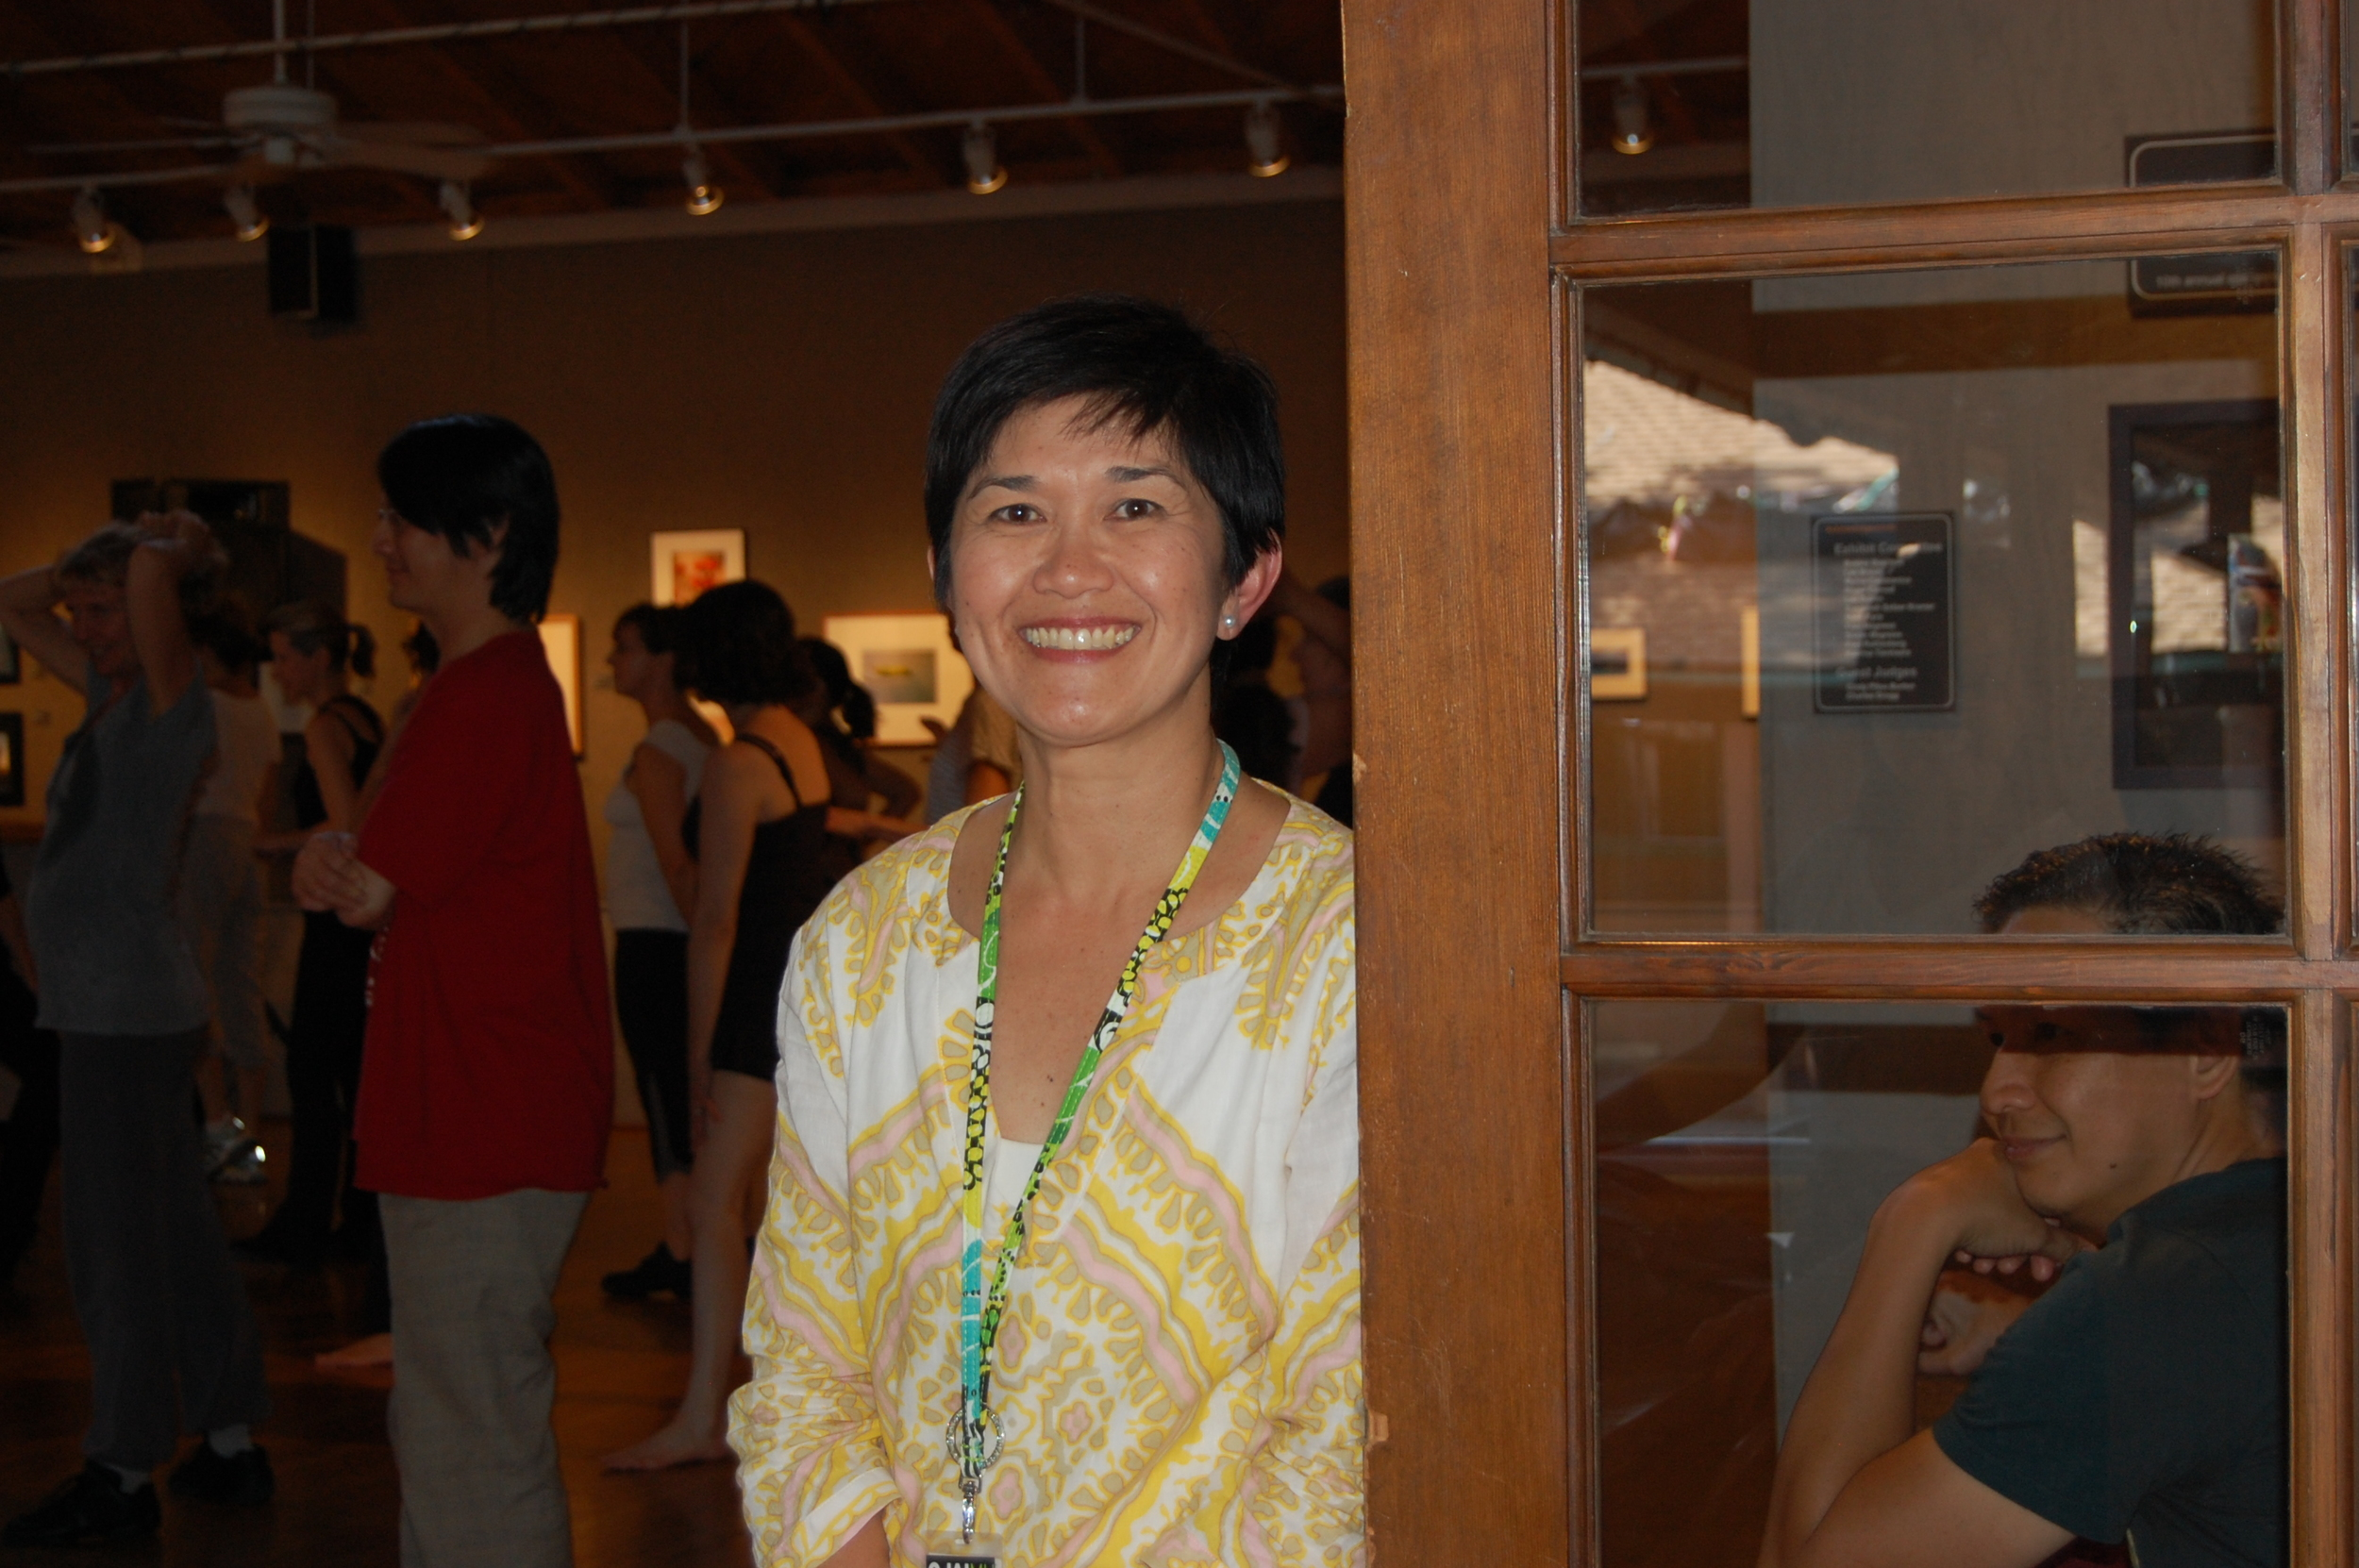 Ojai Music Festival's Gina Gutierrez Director of Marketing and Communications.